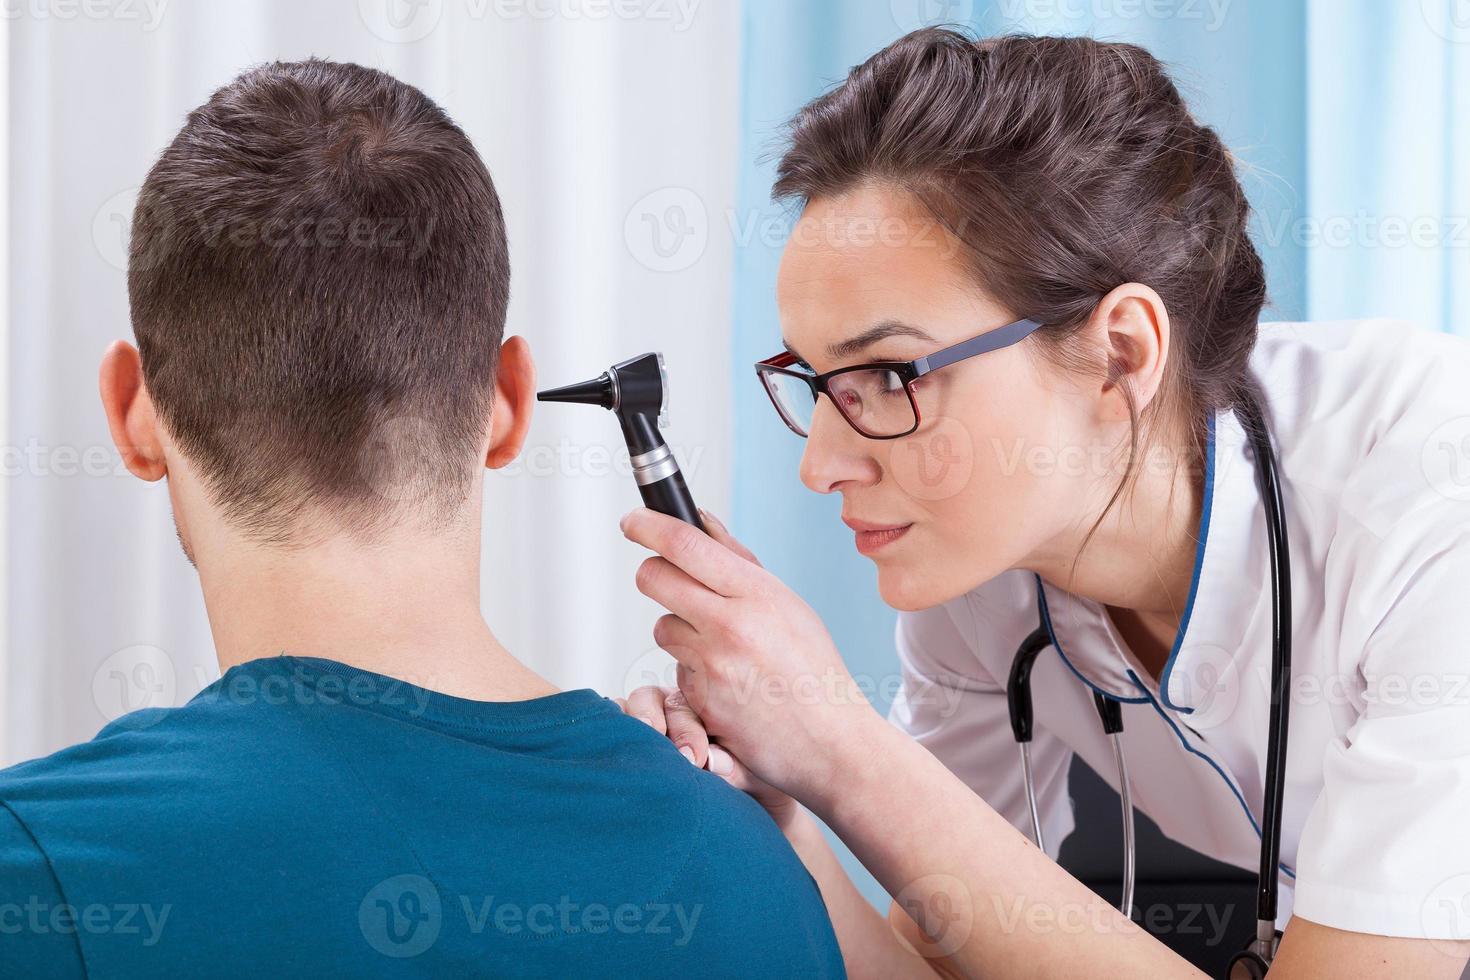 paziente d'esame del medico femminile foto